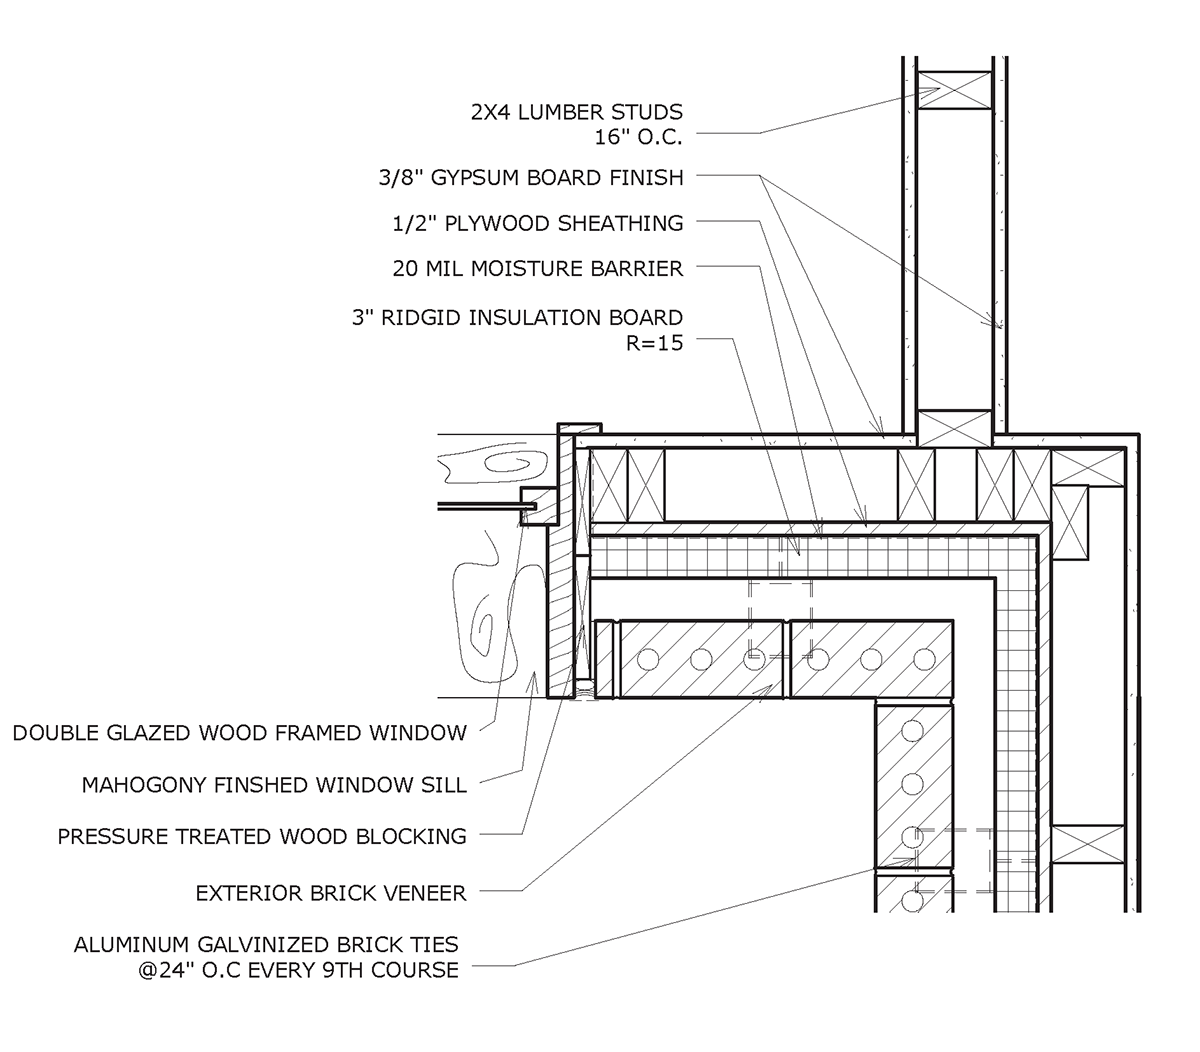 Construction Documentation - Light Wood Framing on Behance